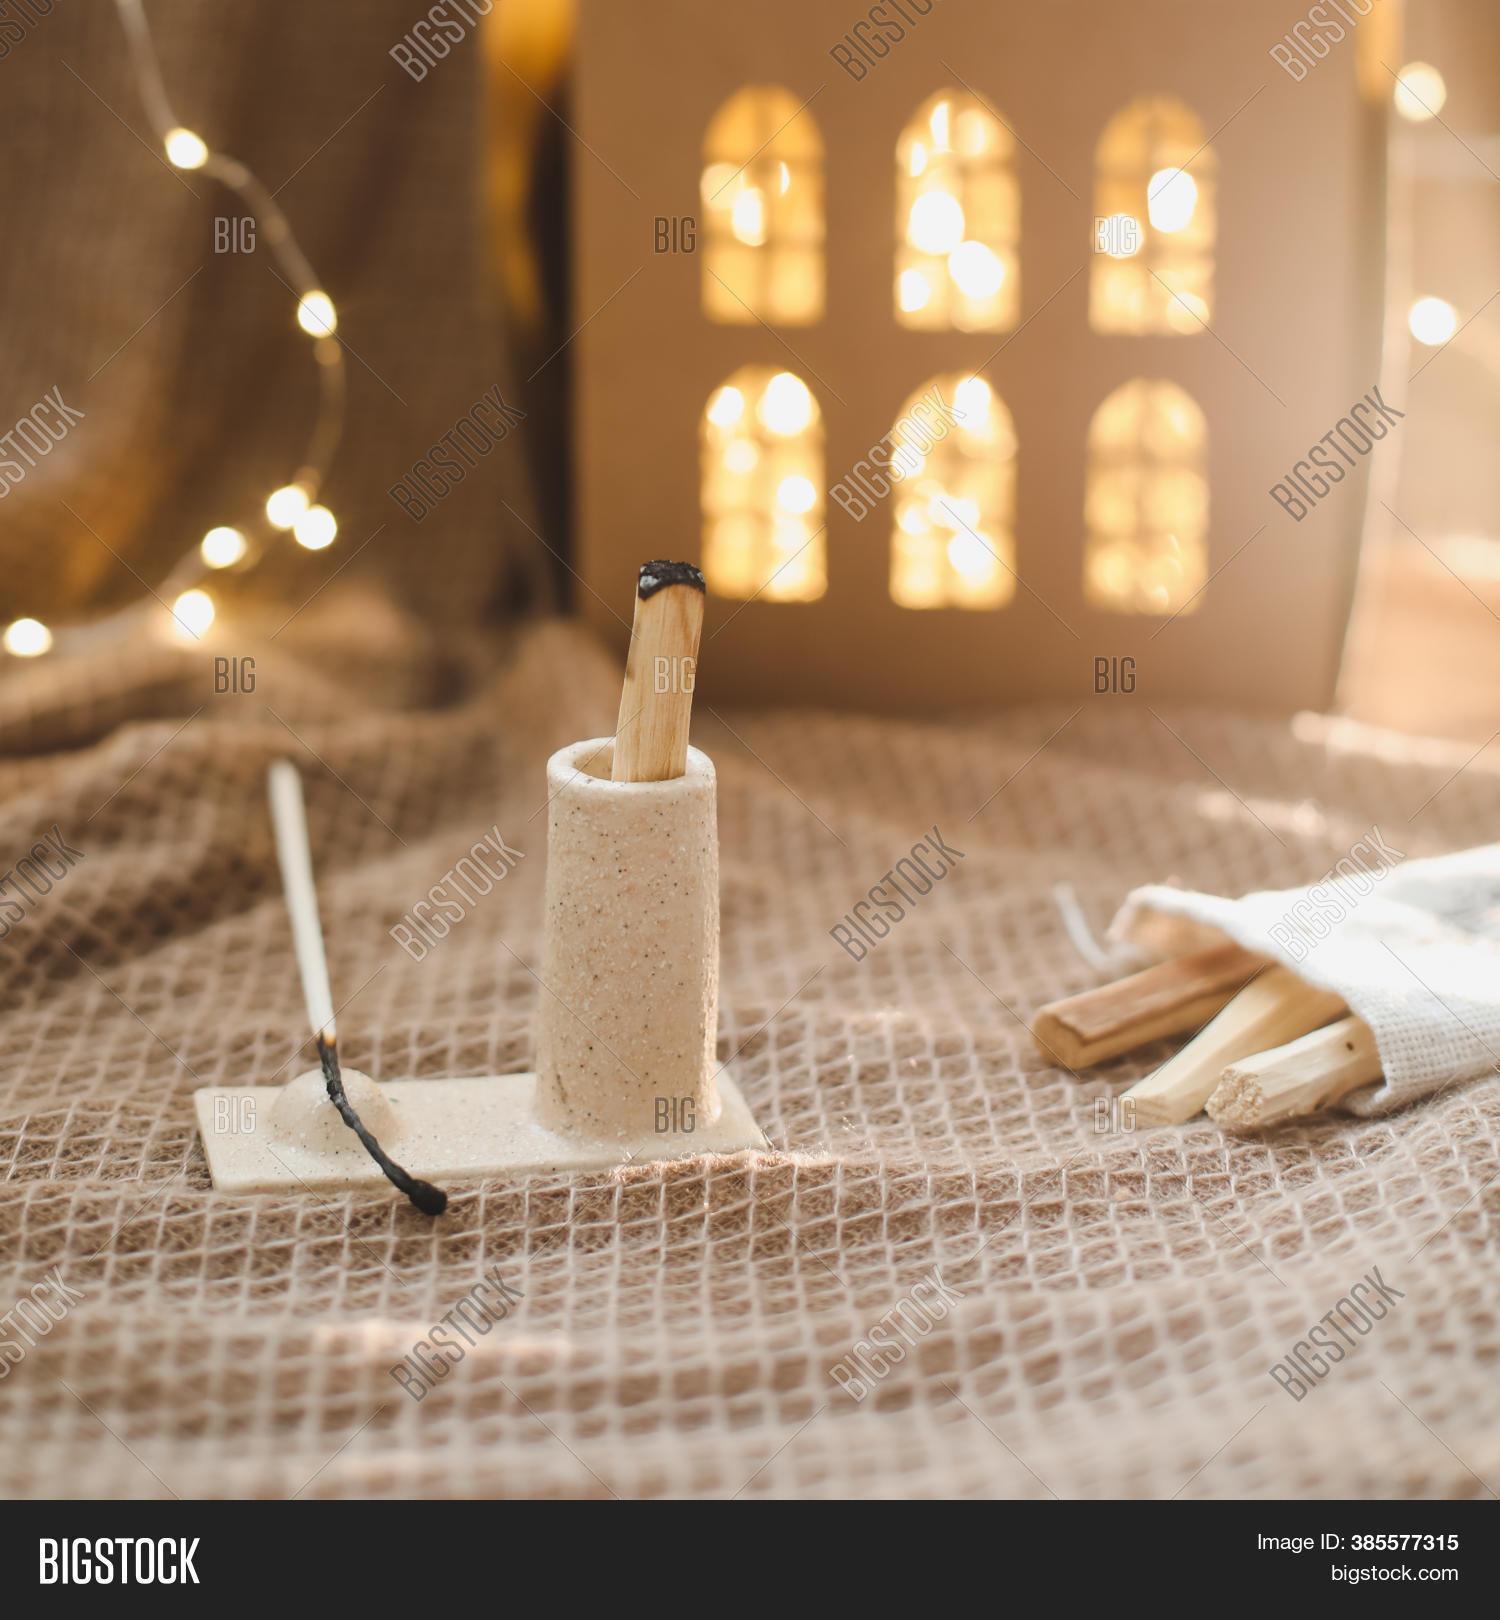 Palo Santo Stick On Image & Photo (Free Trial) | Bigstock